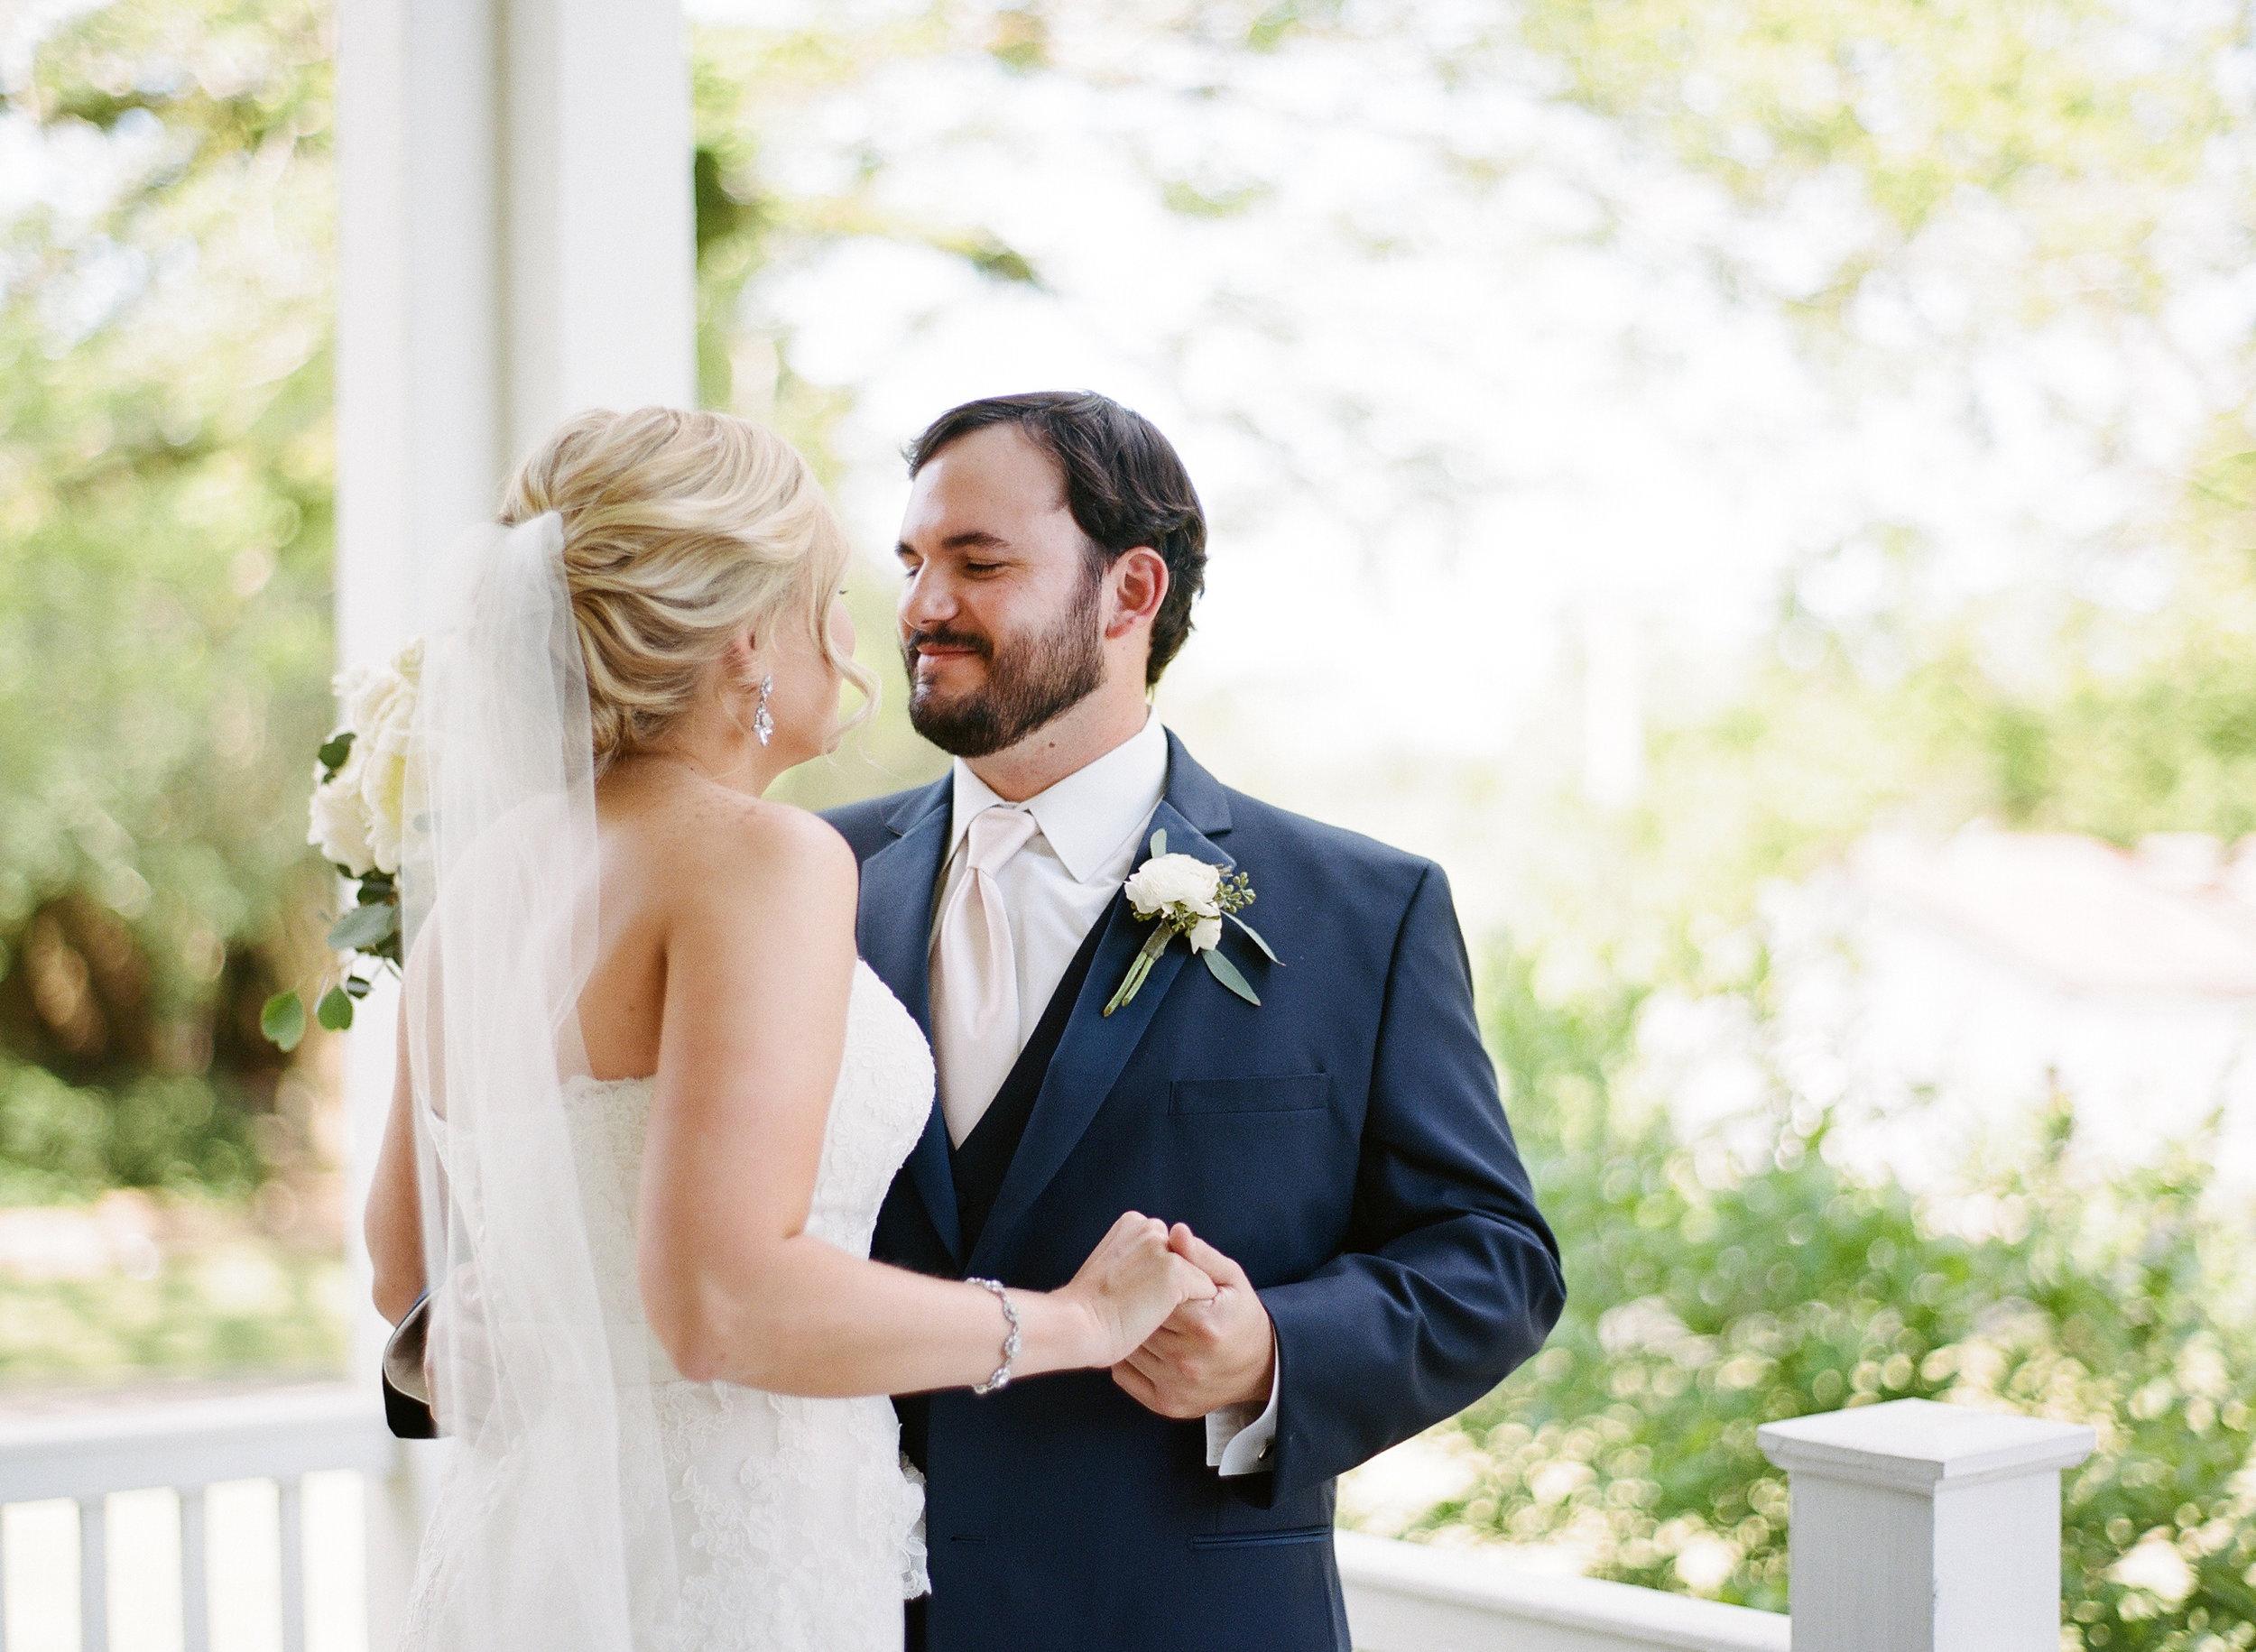 118-CATHERINE GUIDRY WEDDING.jpg